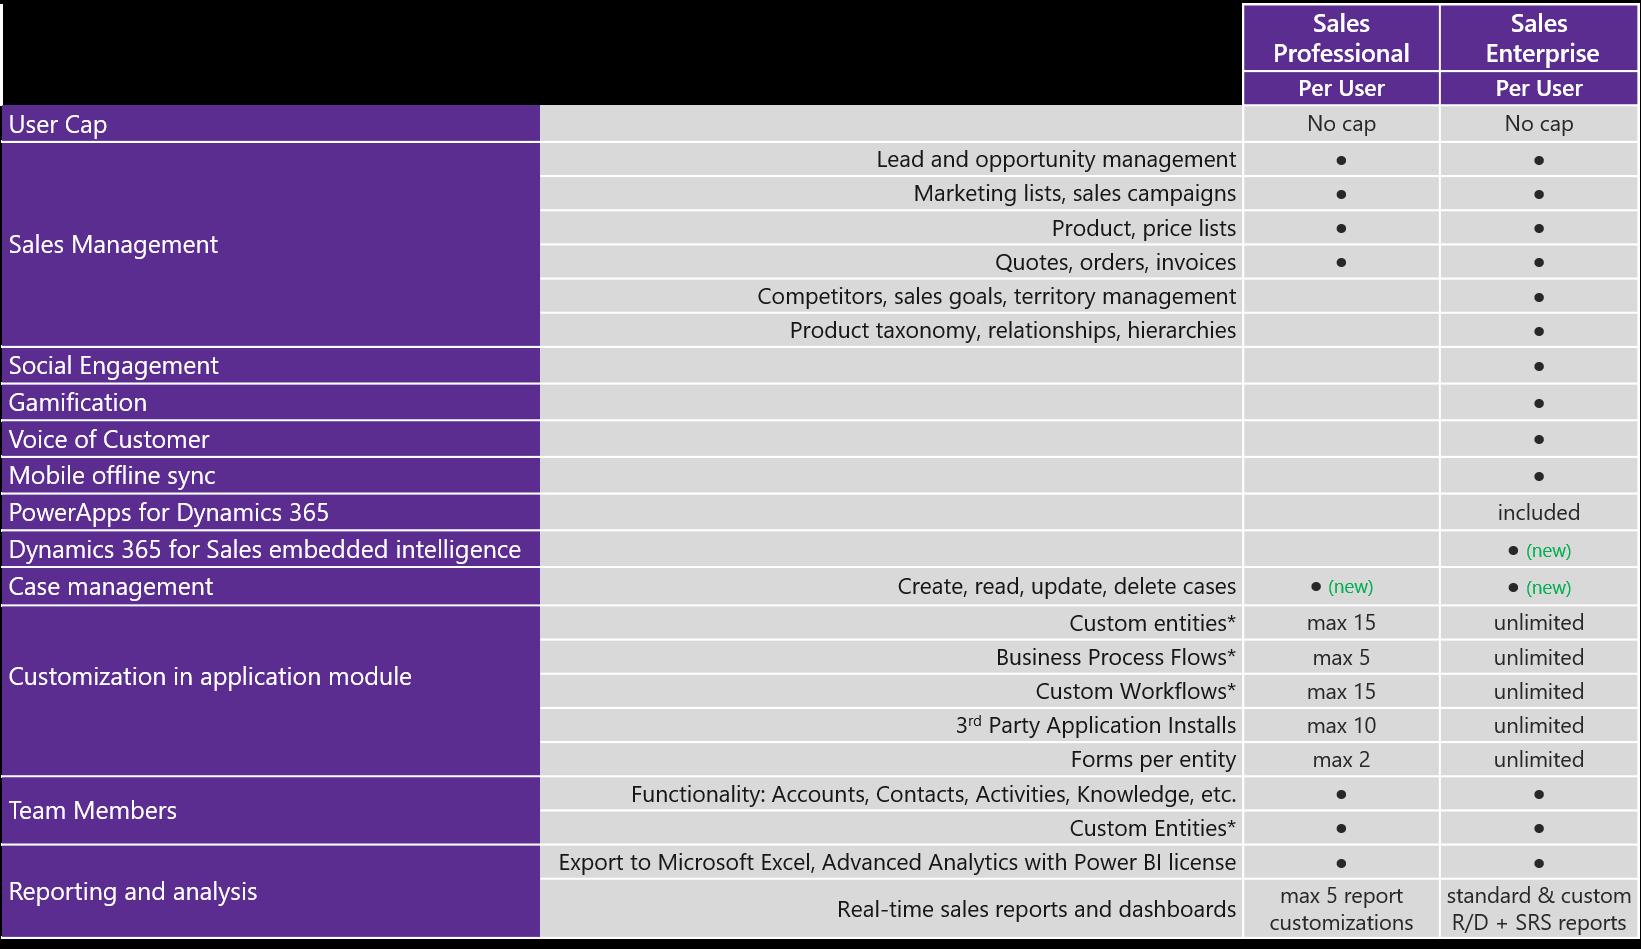 Microsoft Dynamics 365 for Sales Professional vs Enterprise